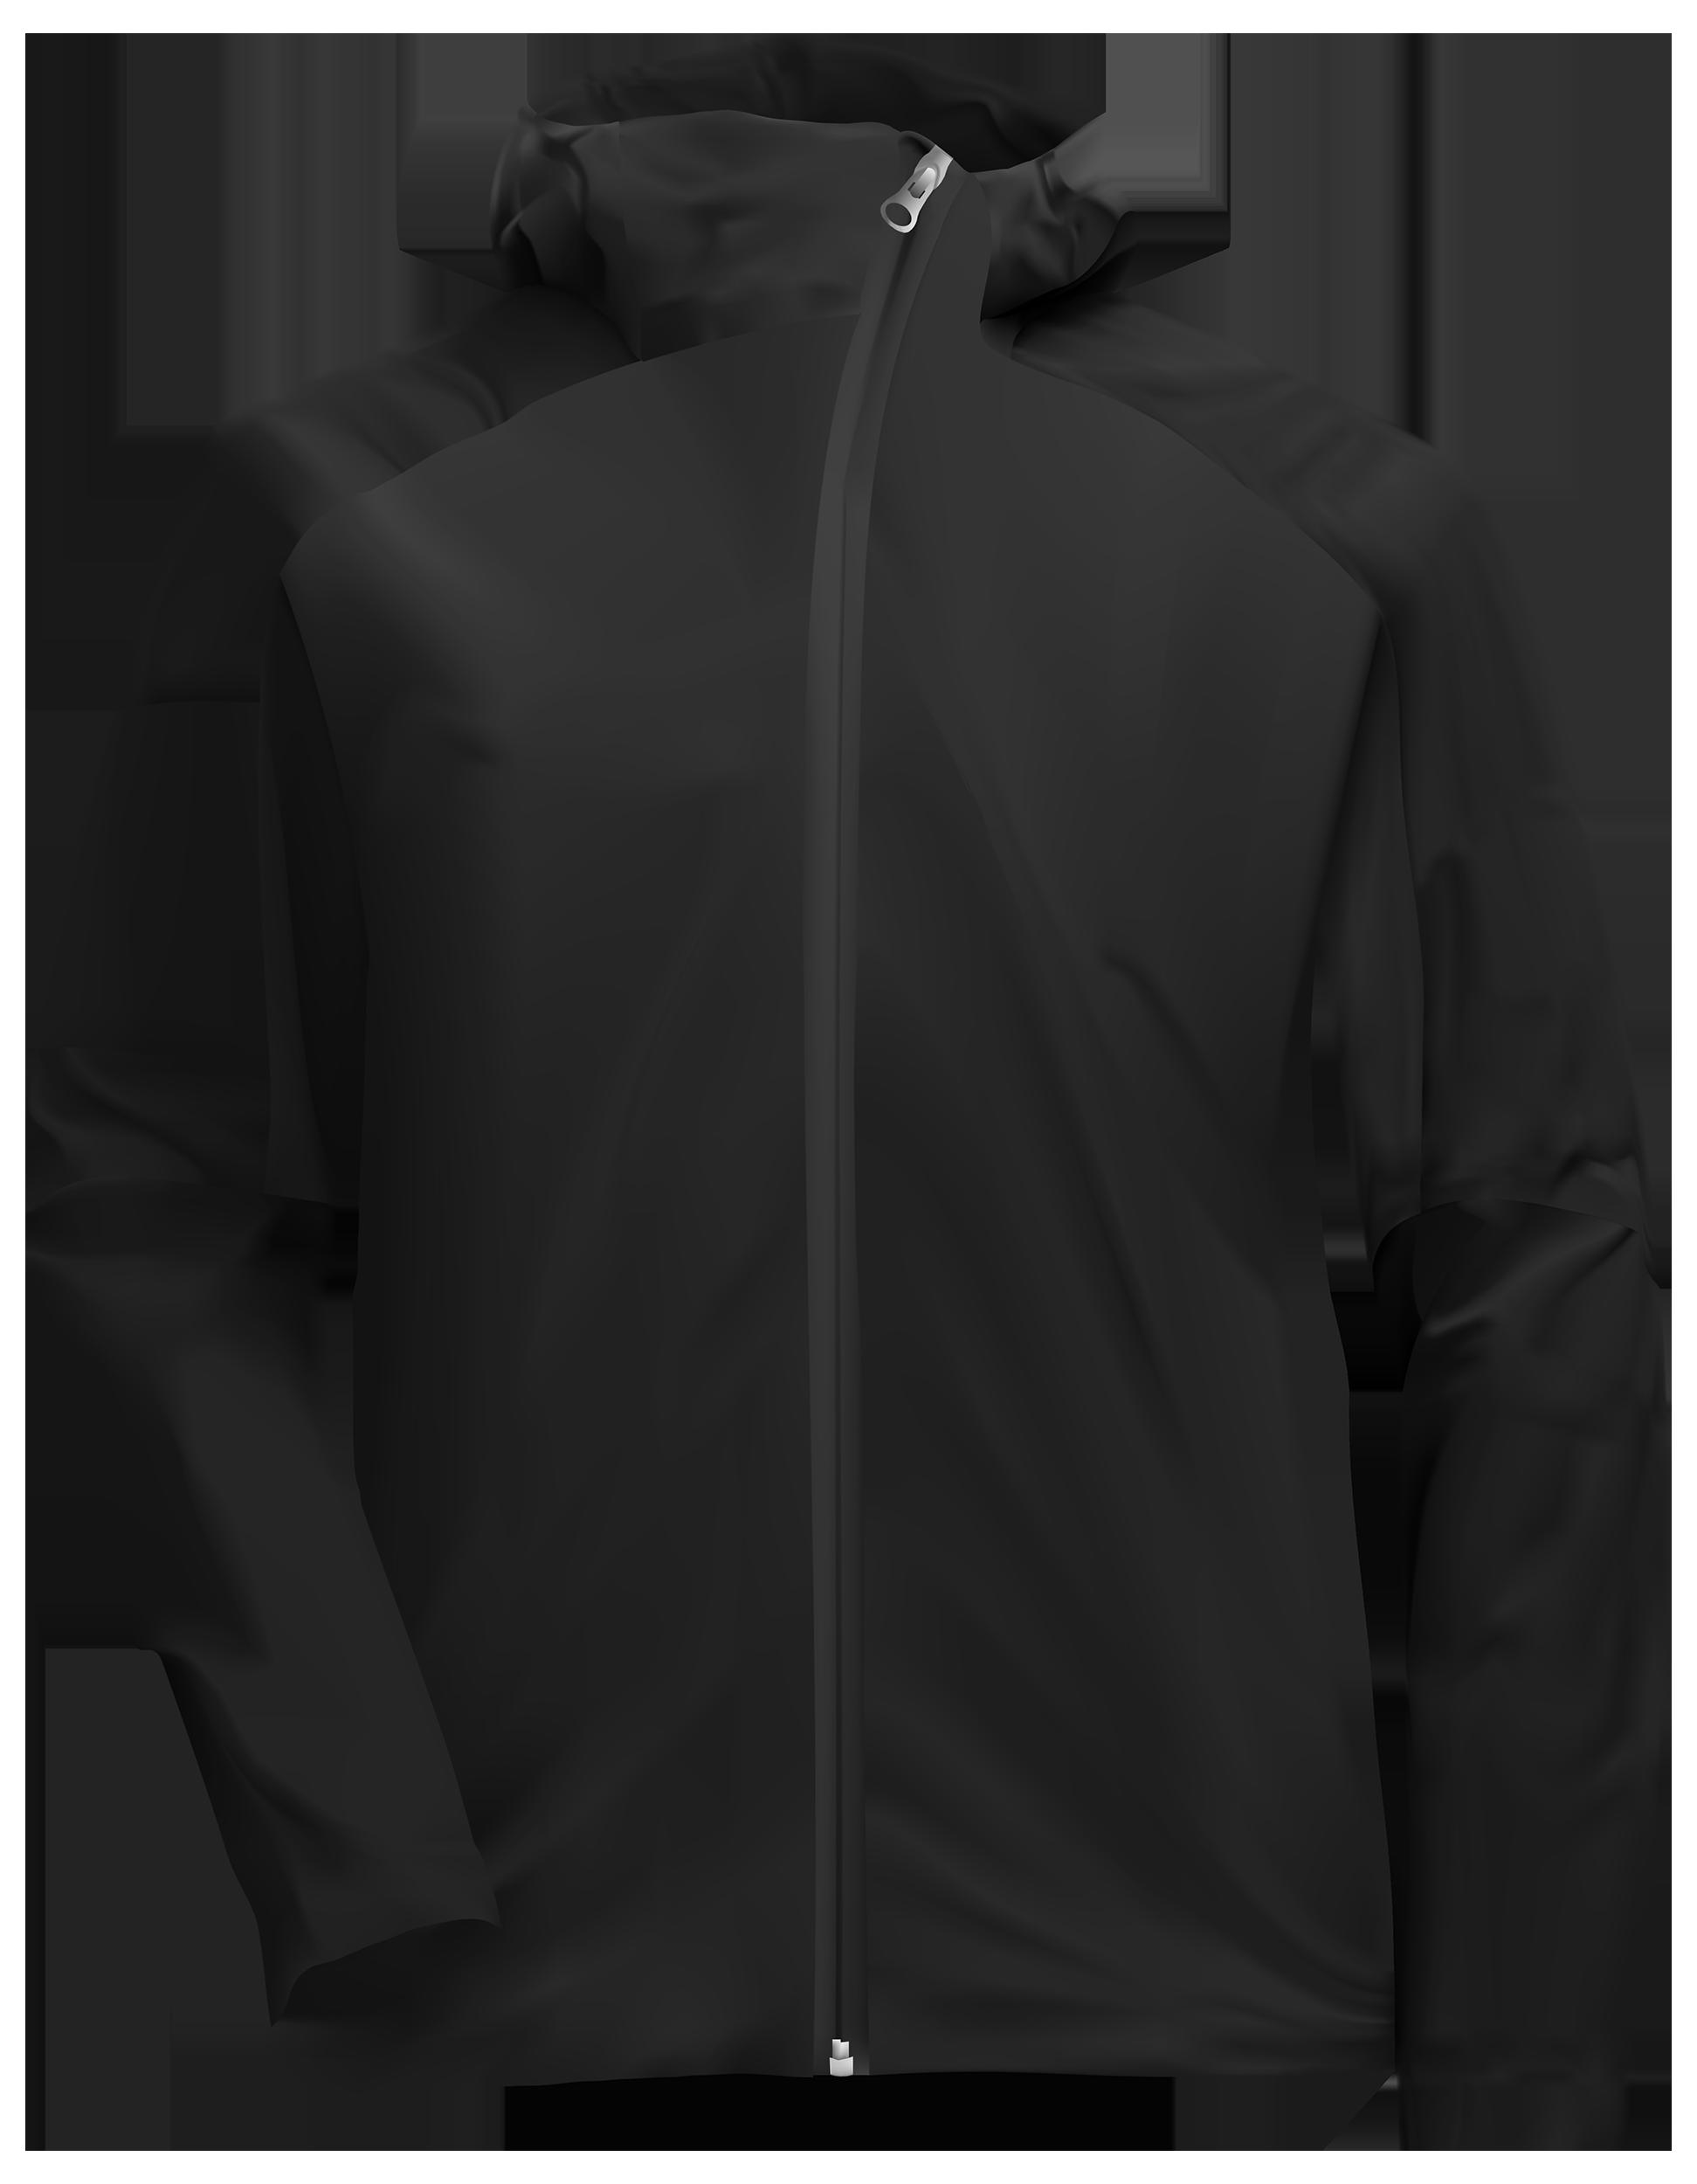 Hoodie clipart sweatsuit. Png best web